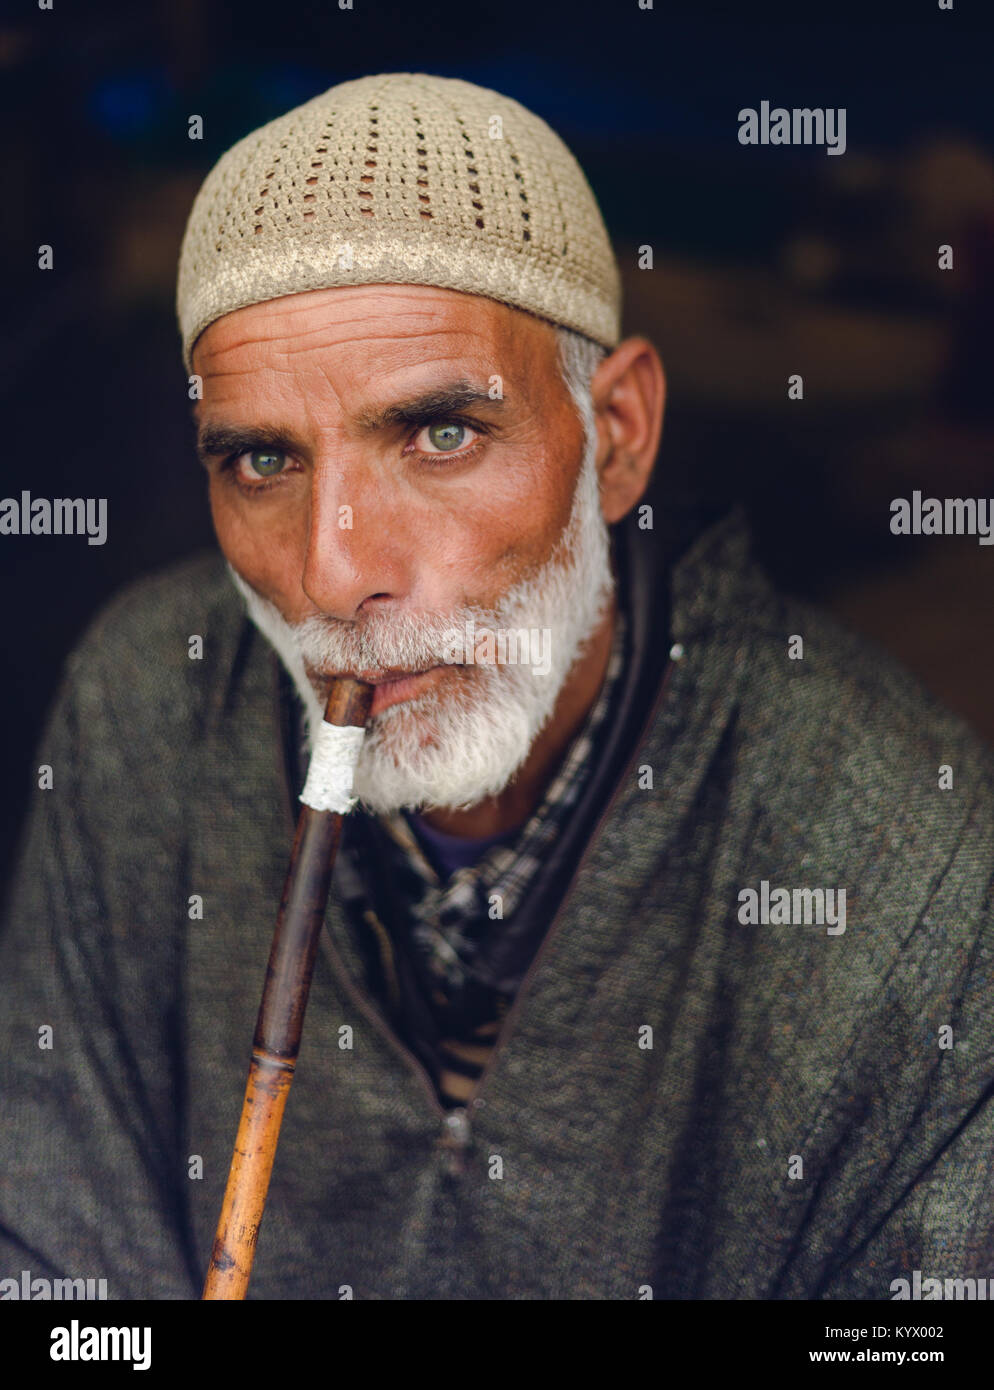 Sonamarg, Jammu & Kashmir - August 11 2017: An Old traditional muslim Kashmiri man smokes Sheesha/Hookah at - Stock Image